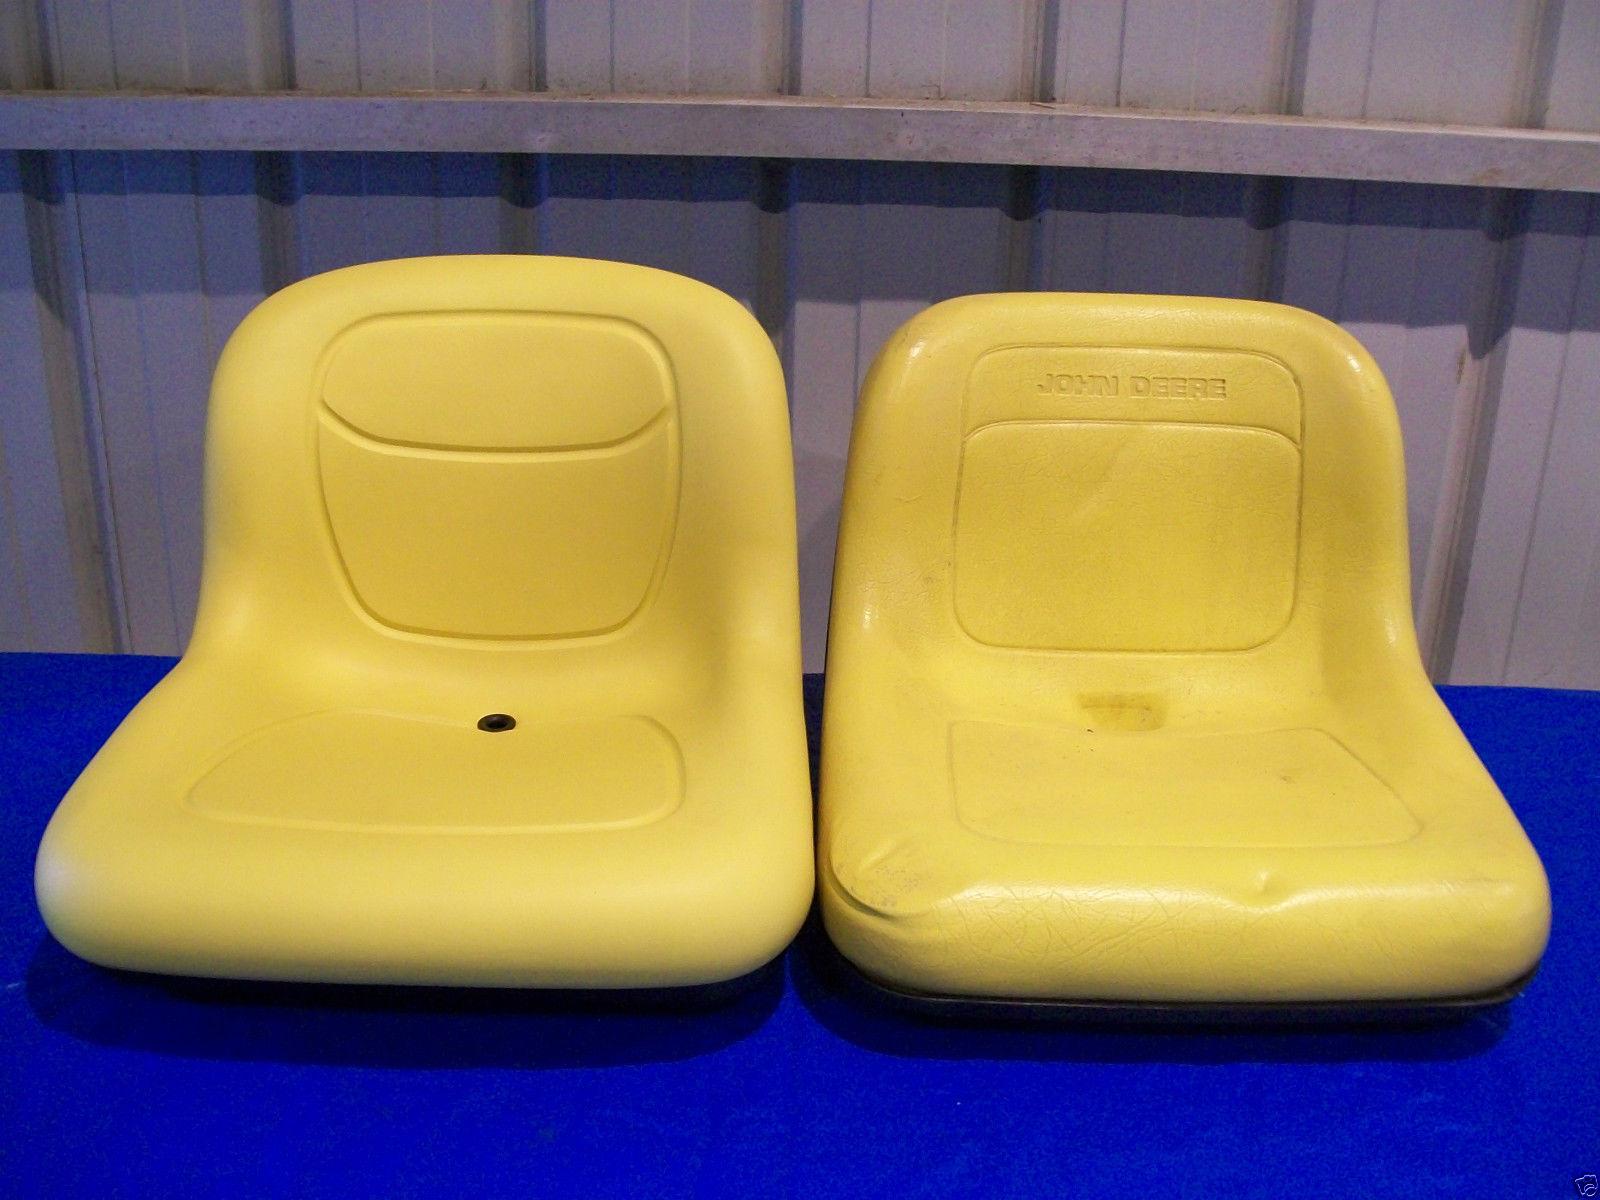 Replacement Lx277 Seats Deere John